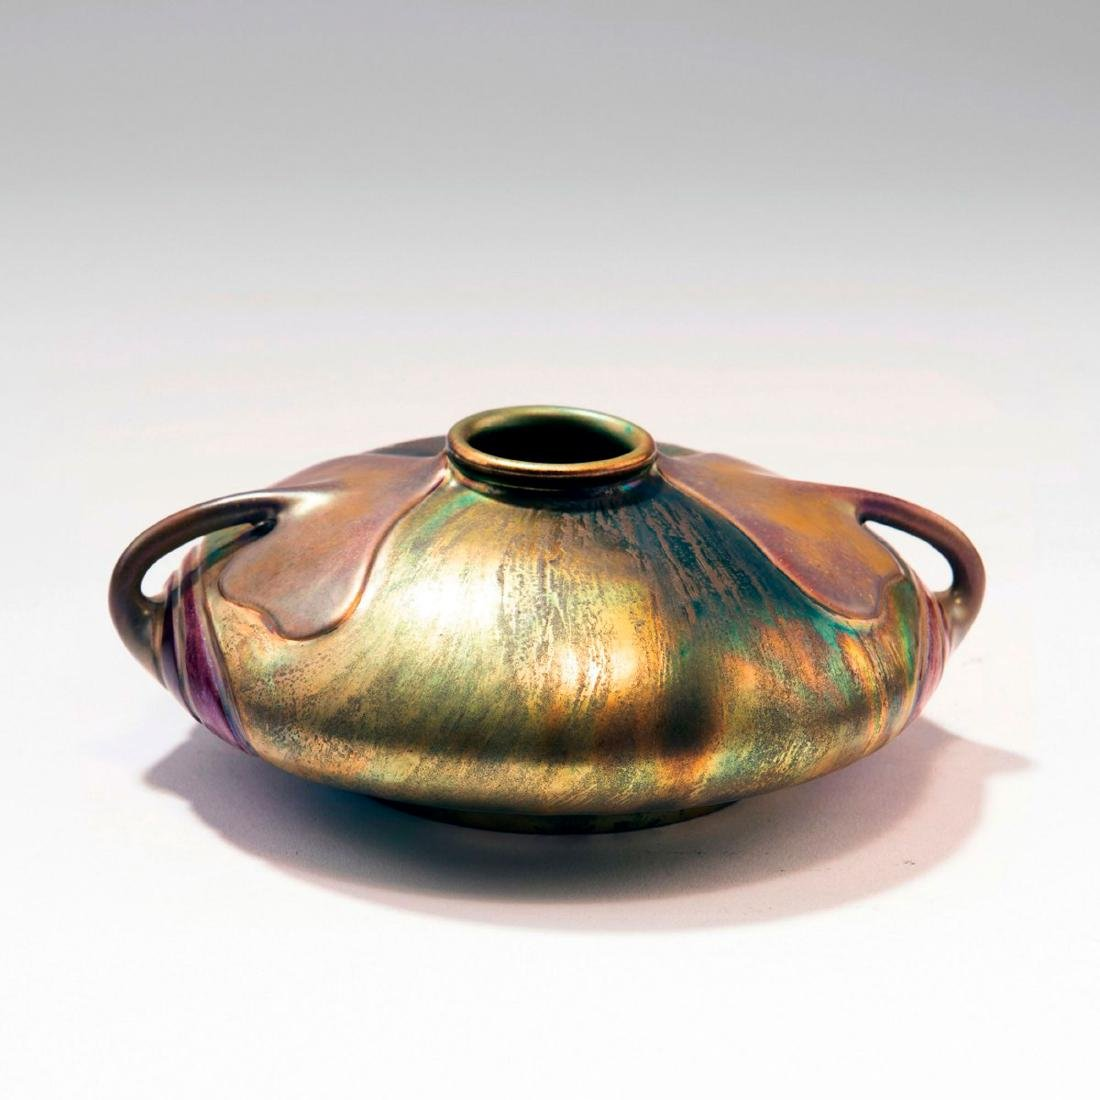 Vase with handles, c. 1906